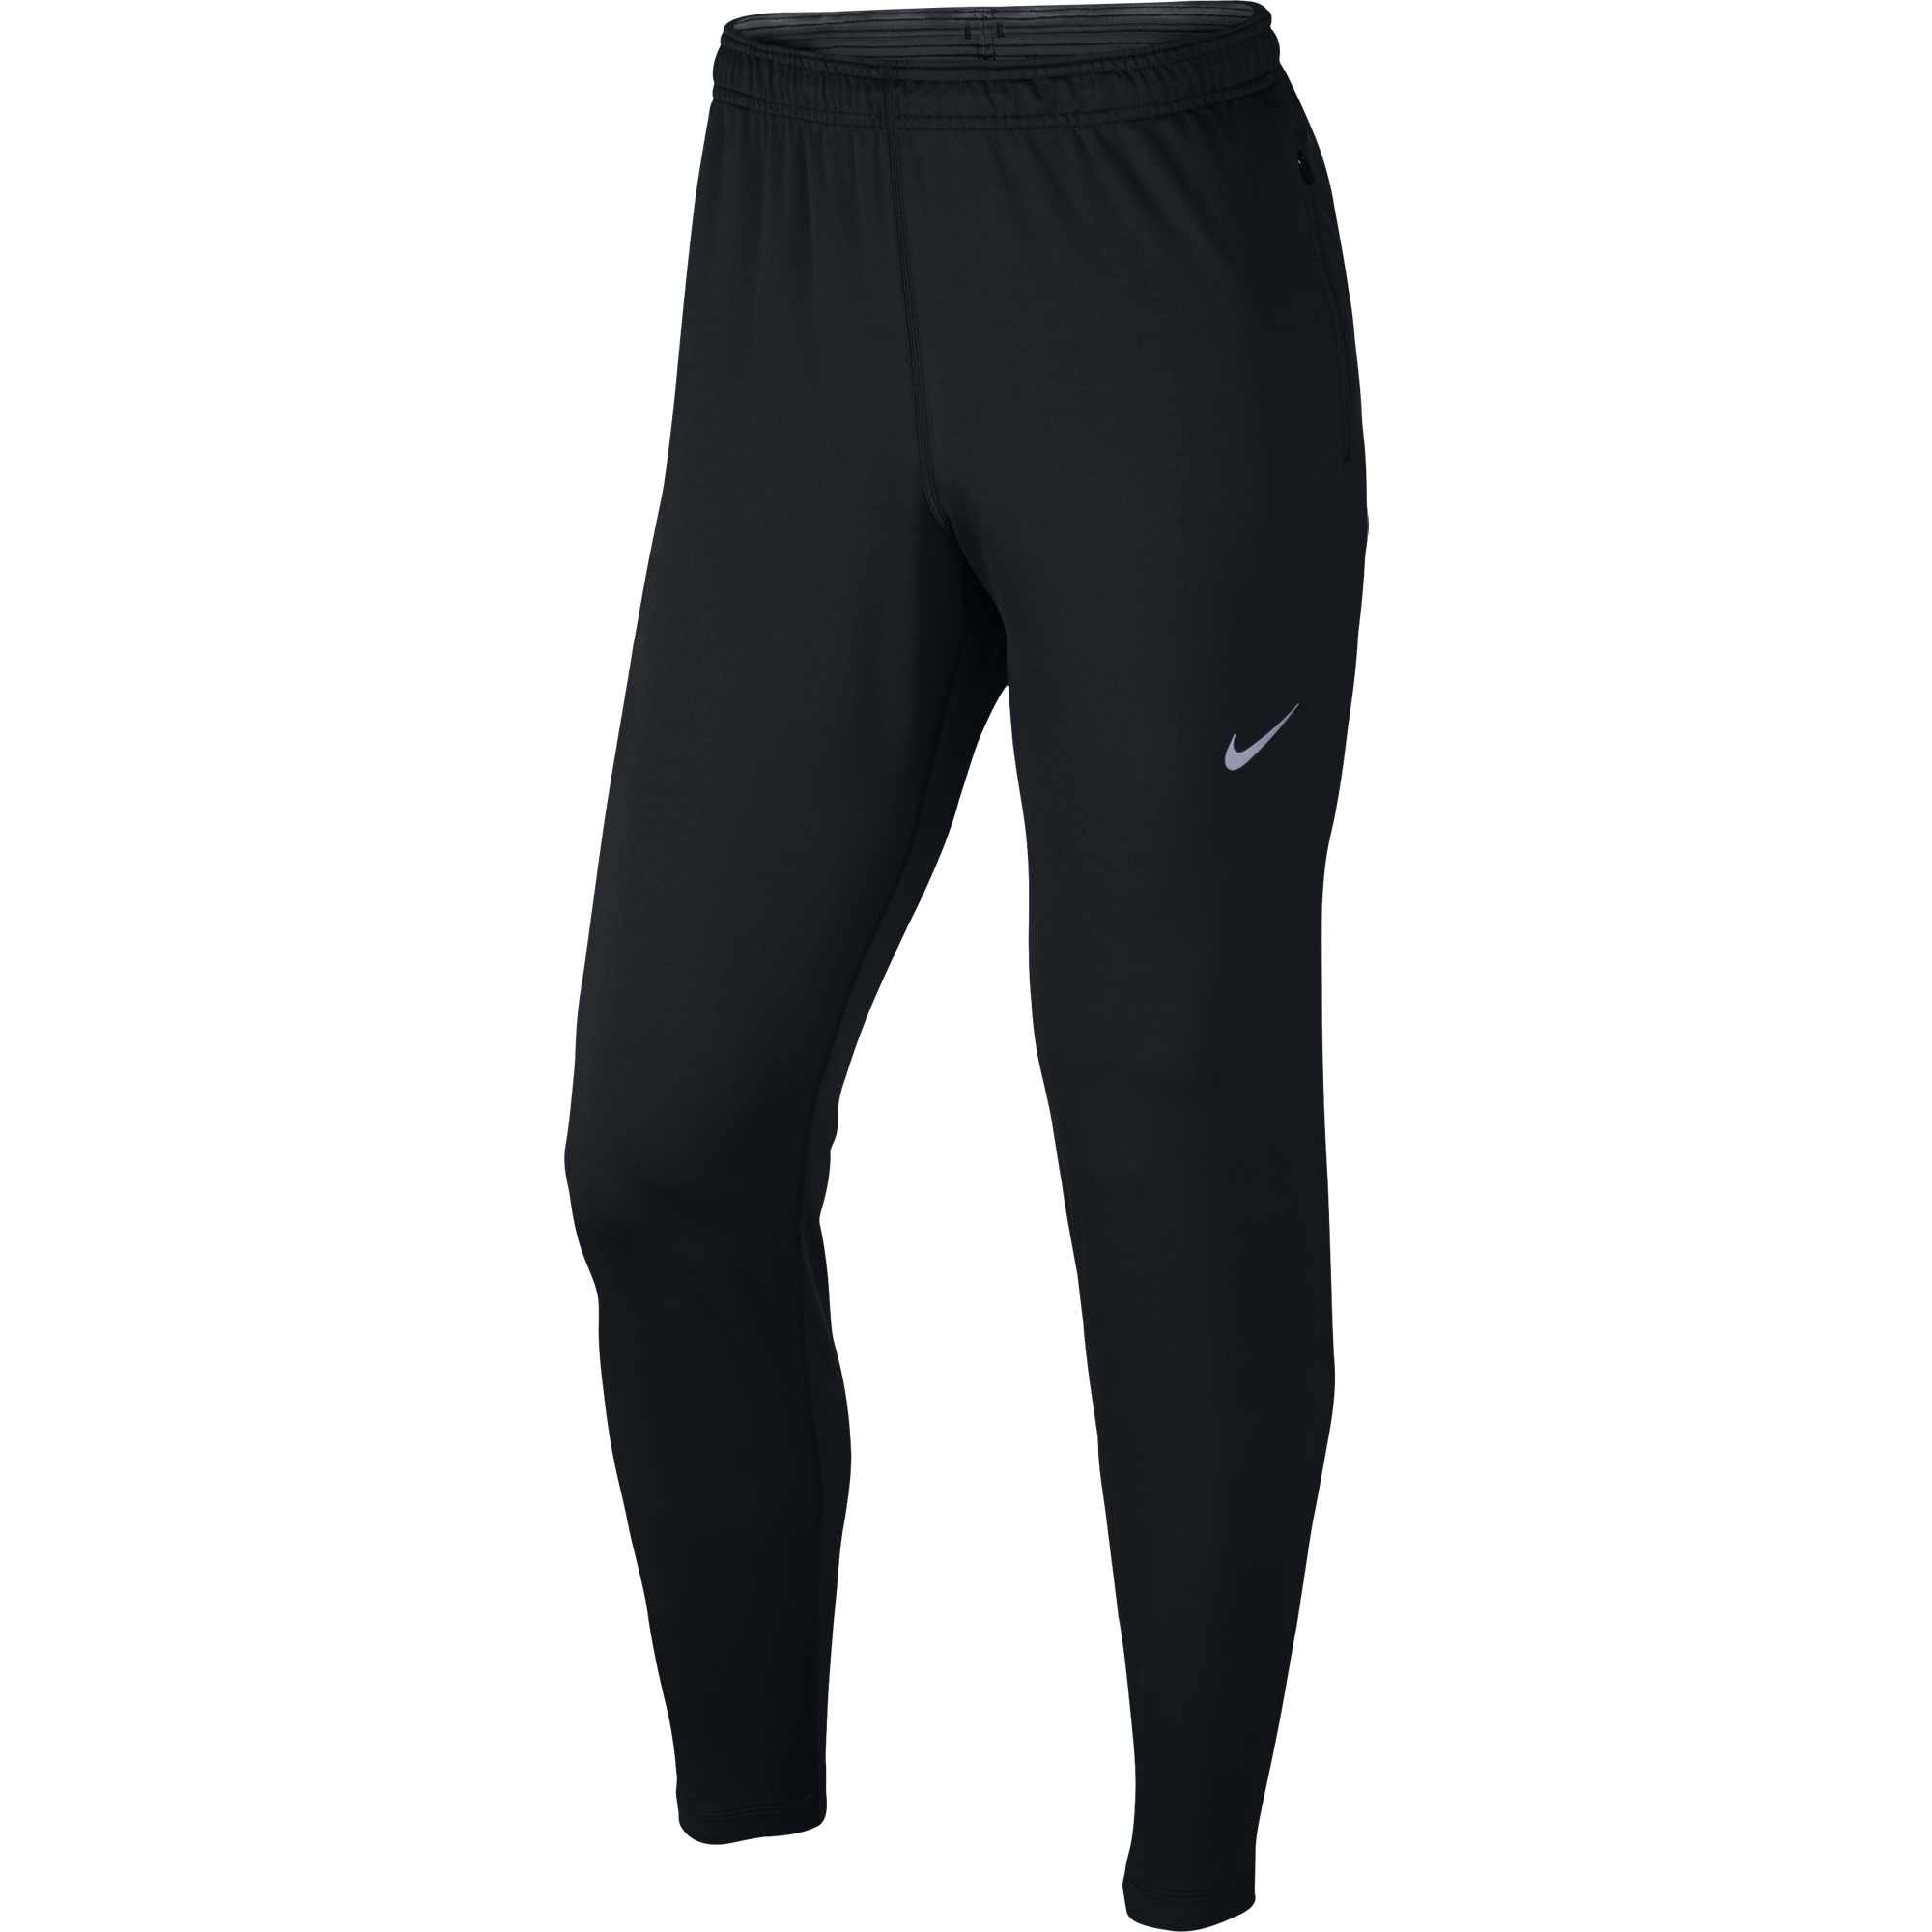 21463cb8 Купить штаны Nike Dri-Fit OTC65 Track Pant | Интернет-магазин RunLab